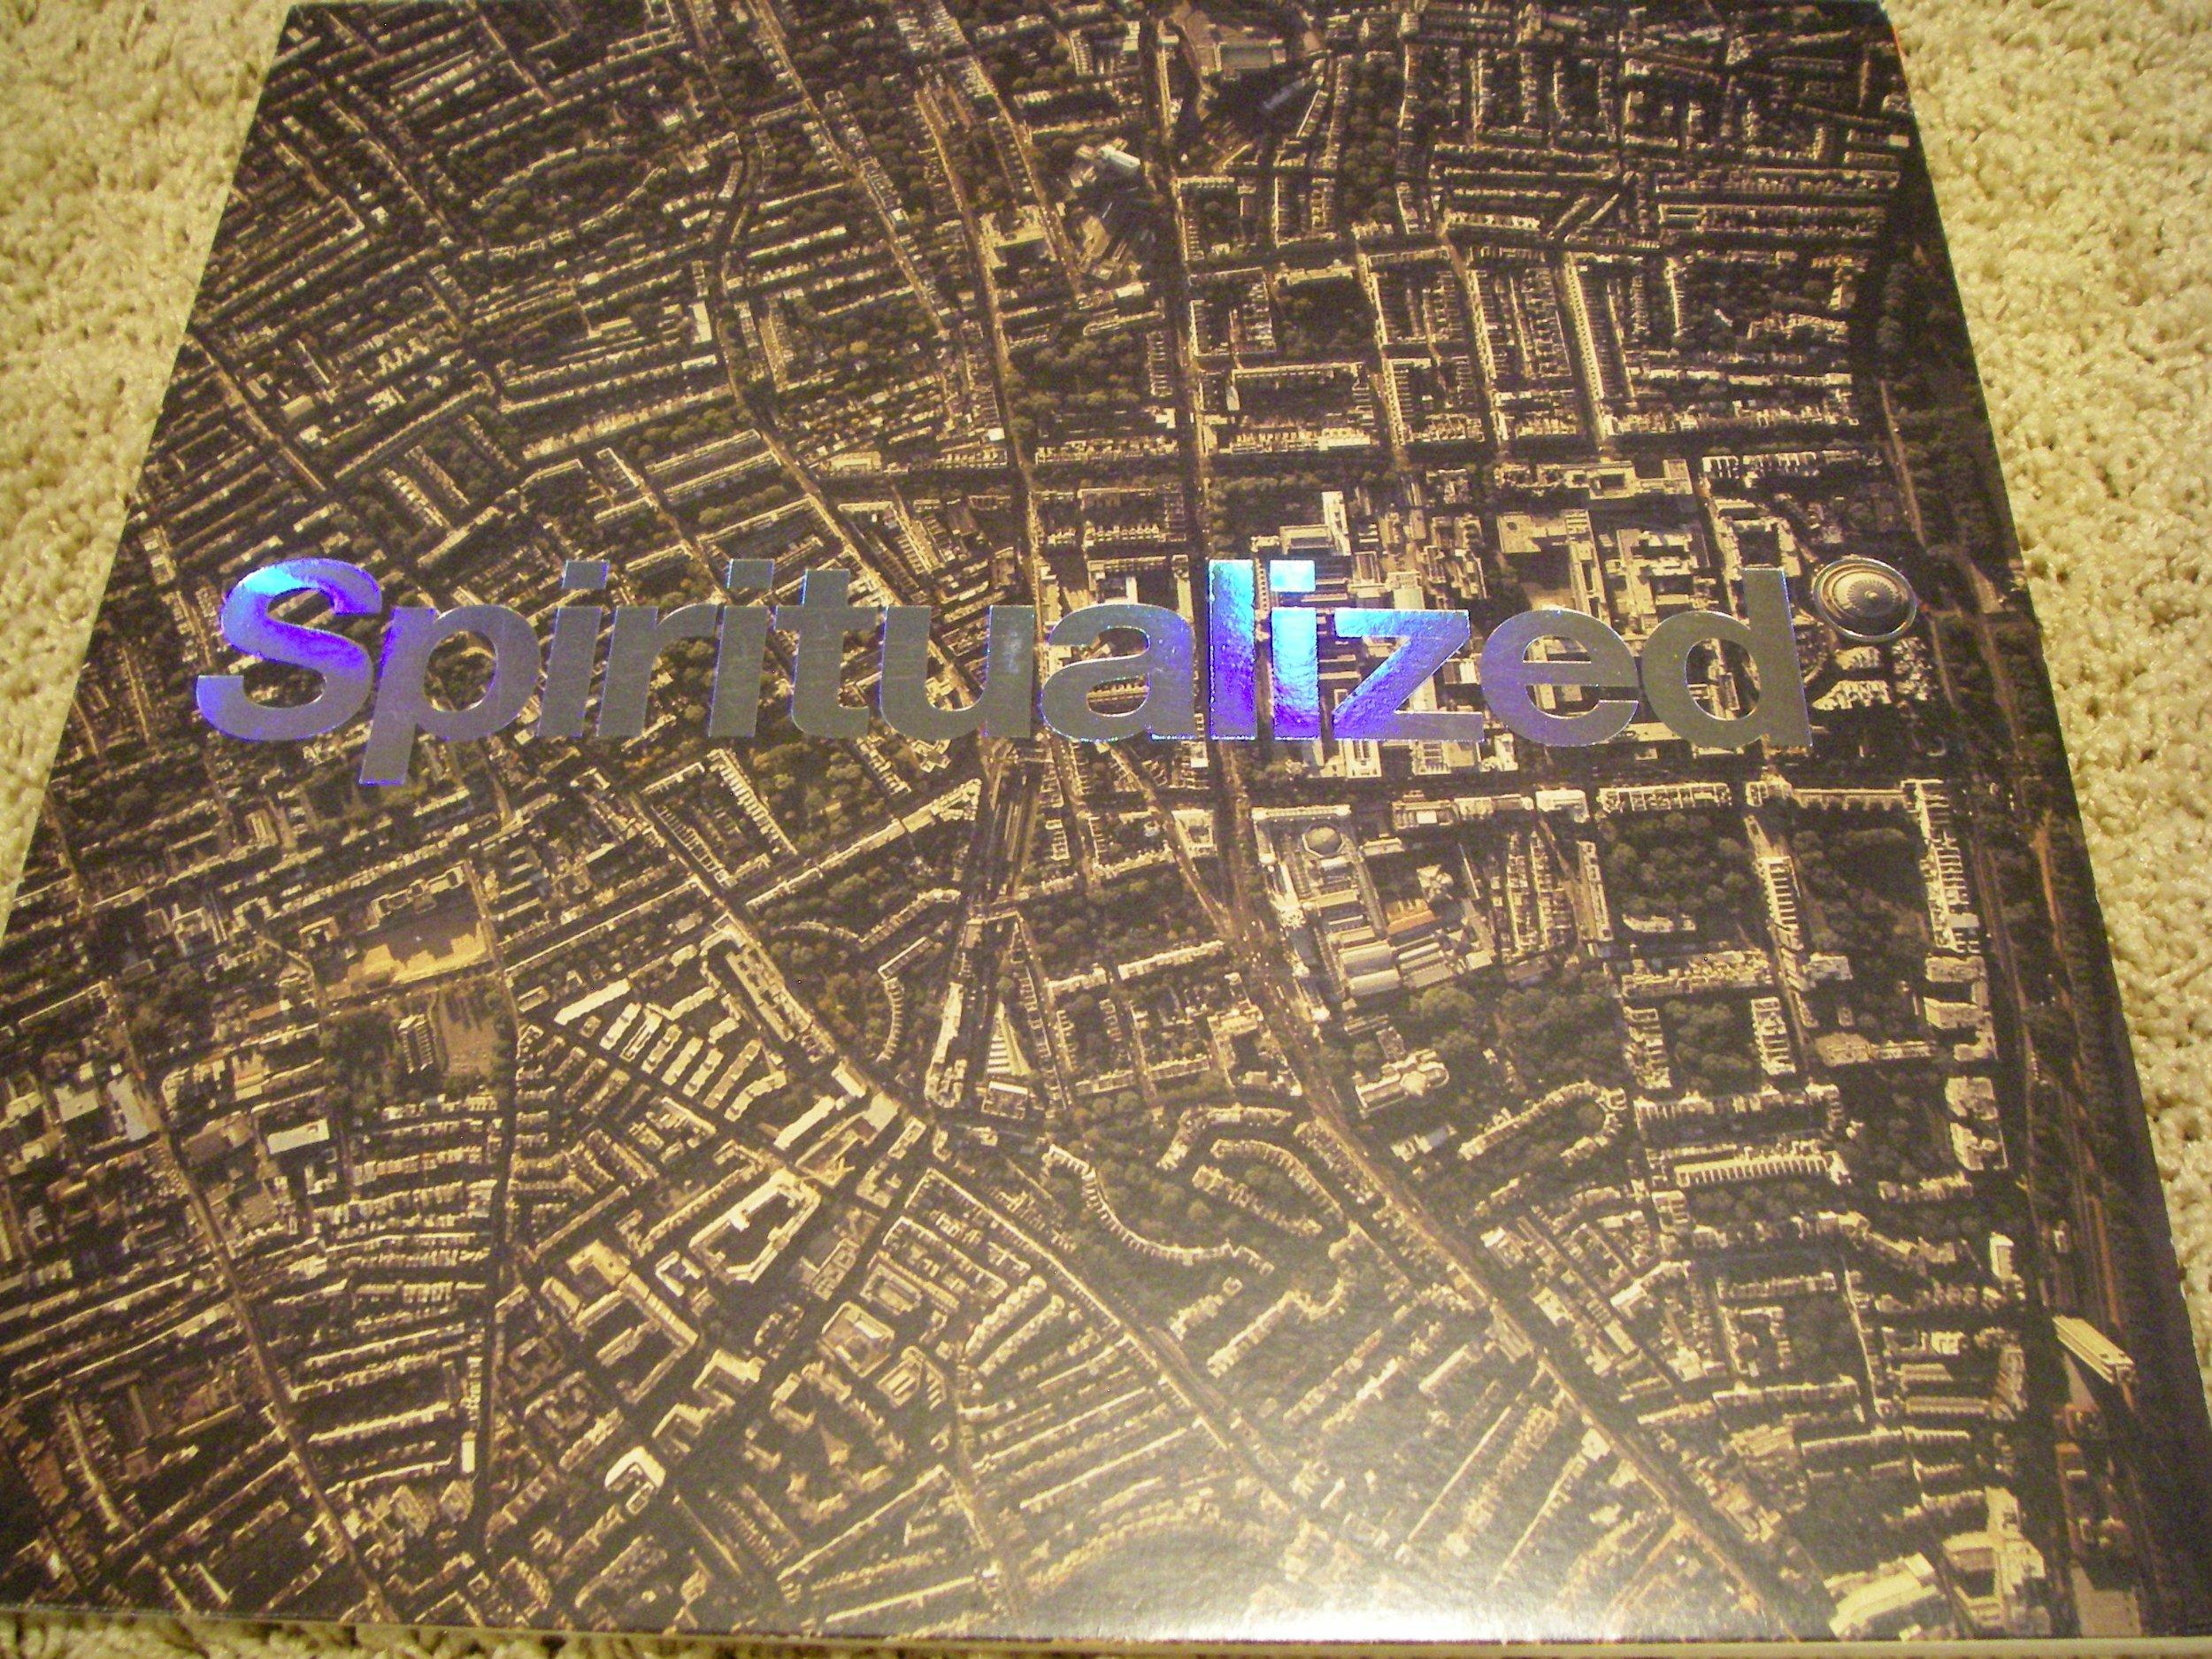 Royal Albert Hall October 1997 [Live][Import] by Deconstruction Ltd.